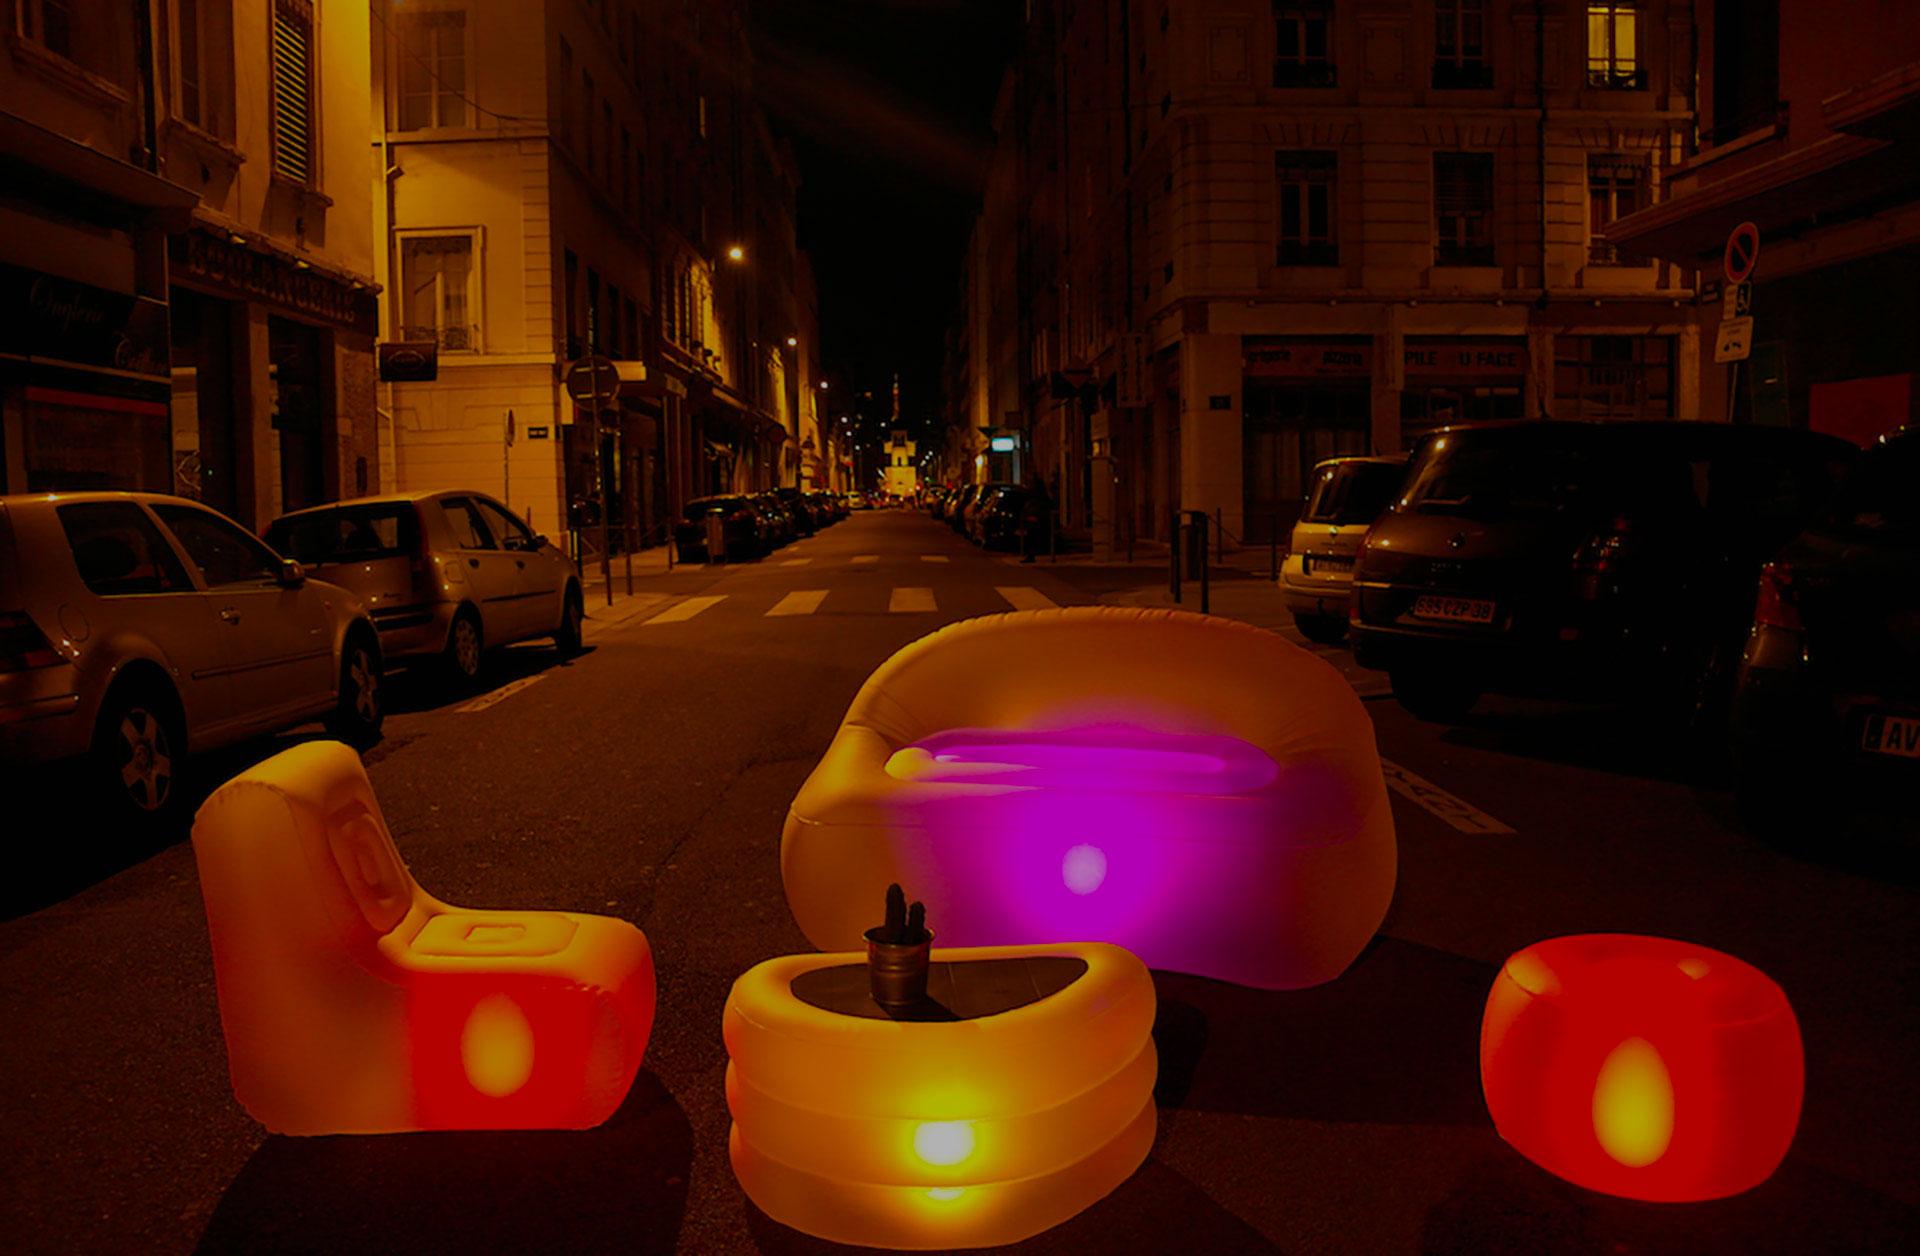 meubles-gonflables-lumineux-nuit